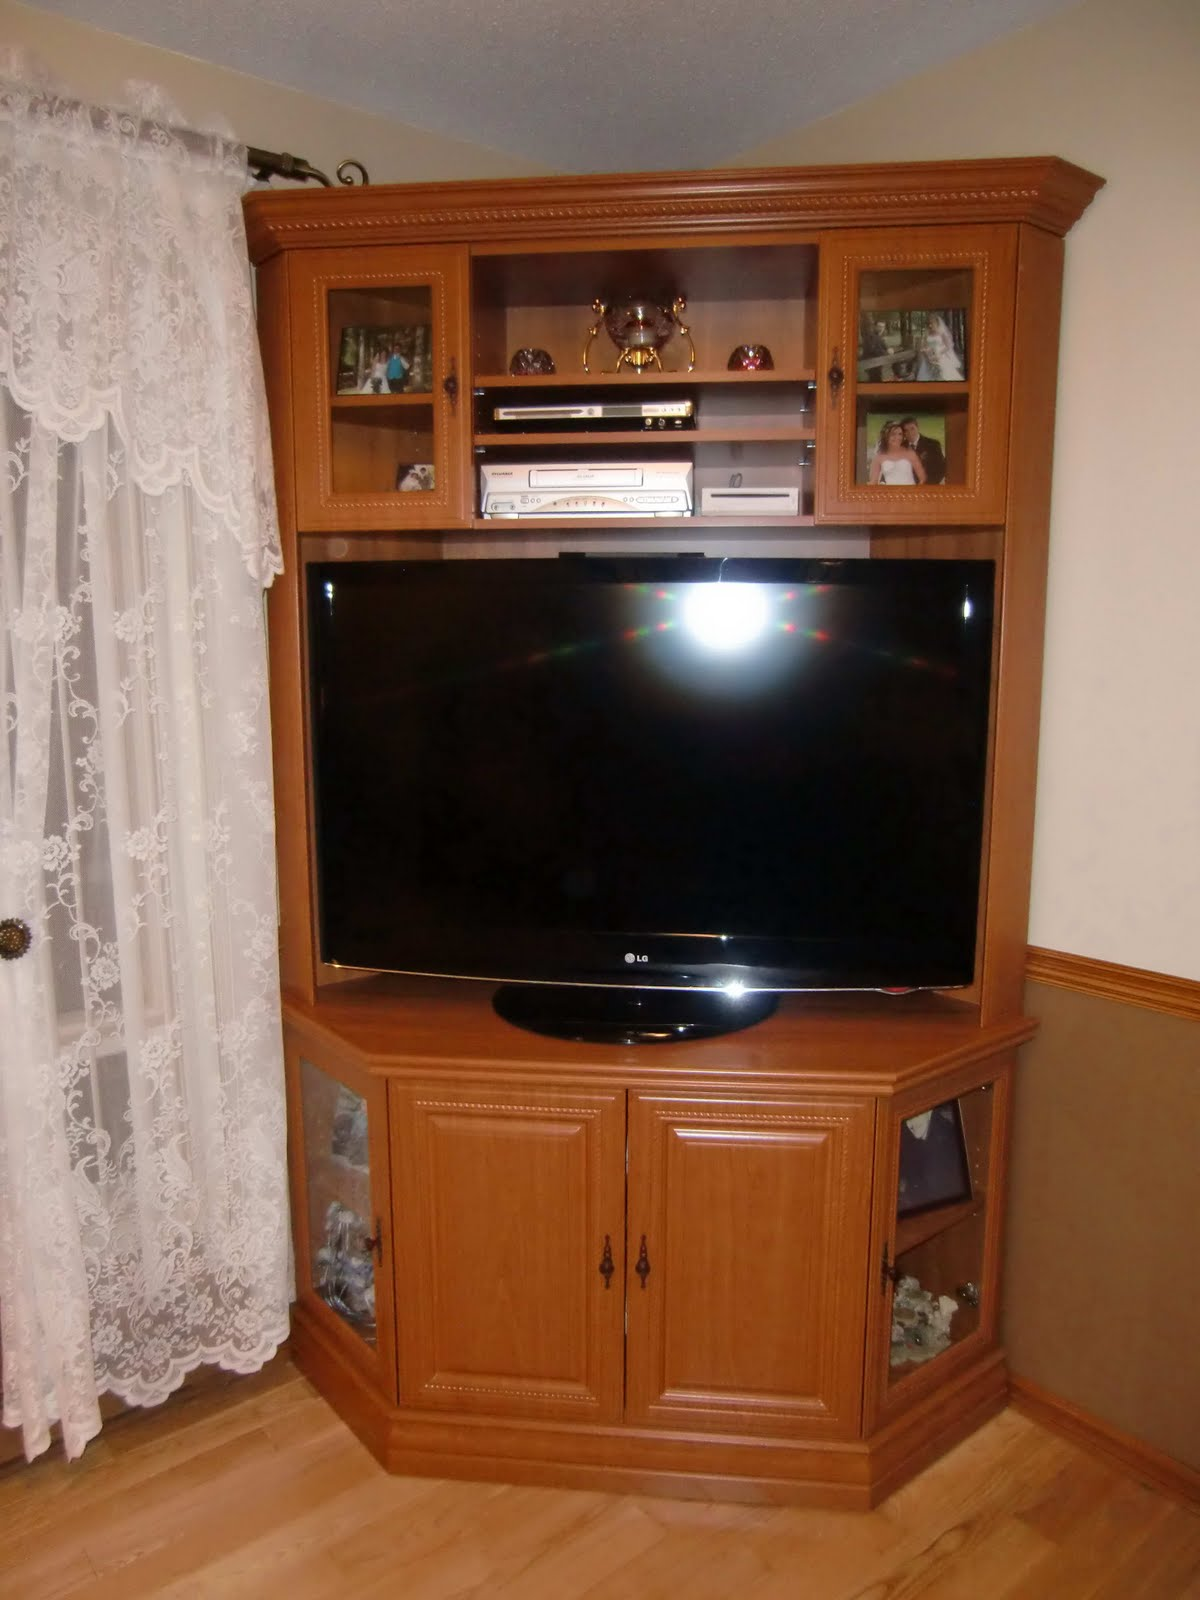 Bibliotheque Meuble Tv Ordinateur Fenrez Com Sammlung Von  # Bibliotheque Meuble Tv Ordinateur